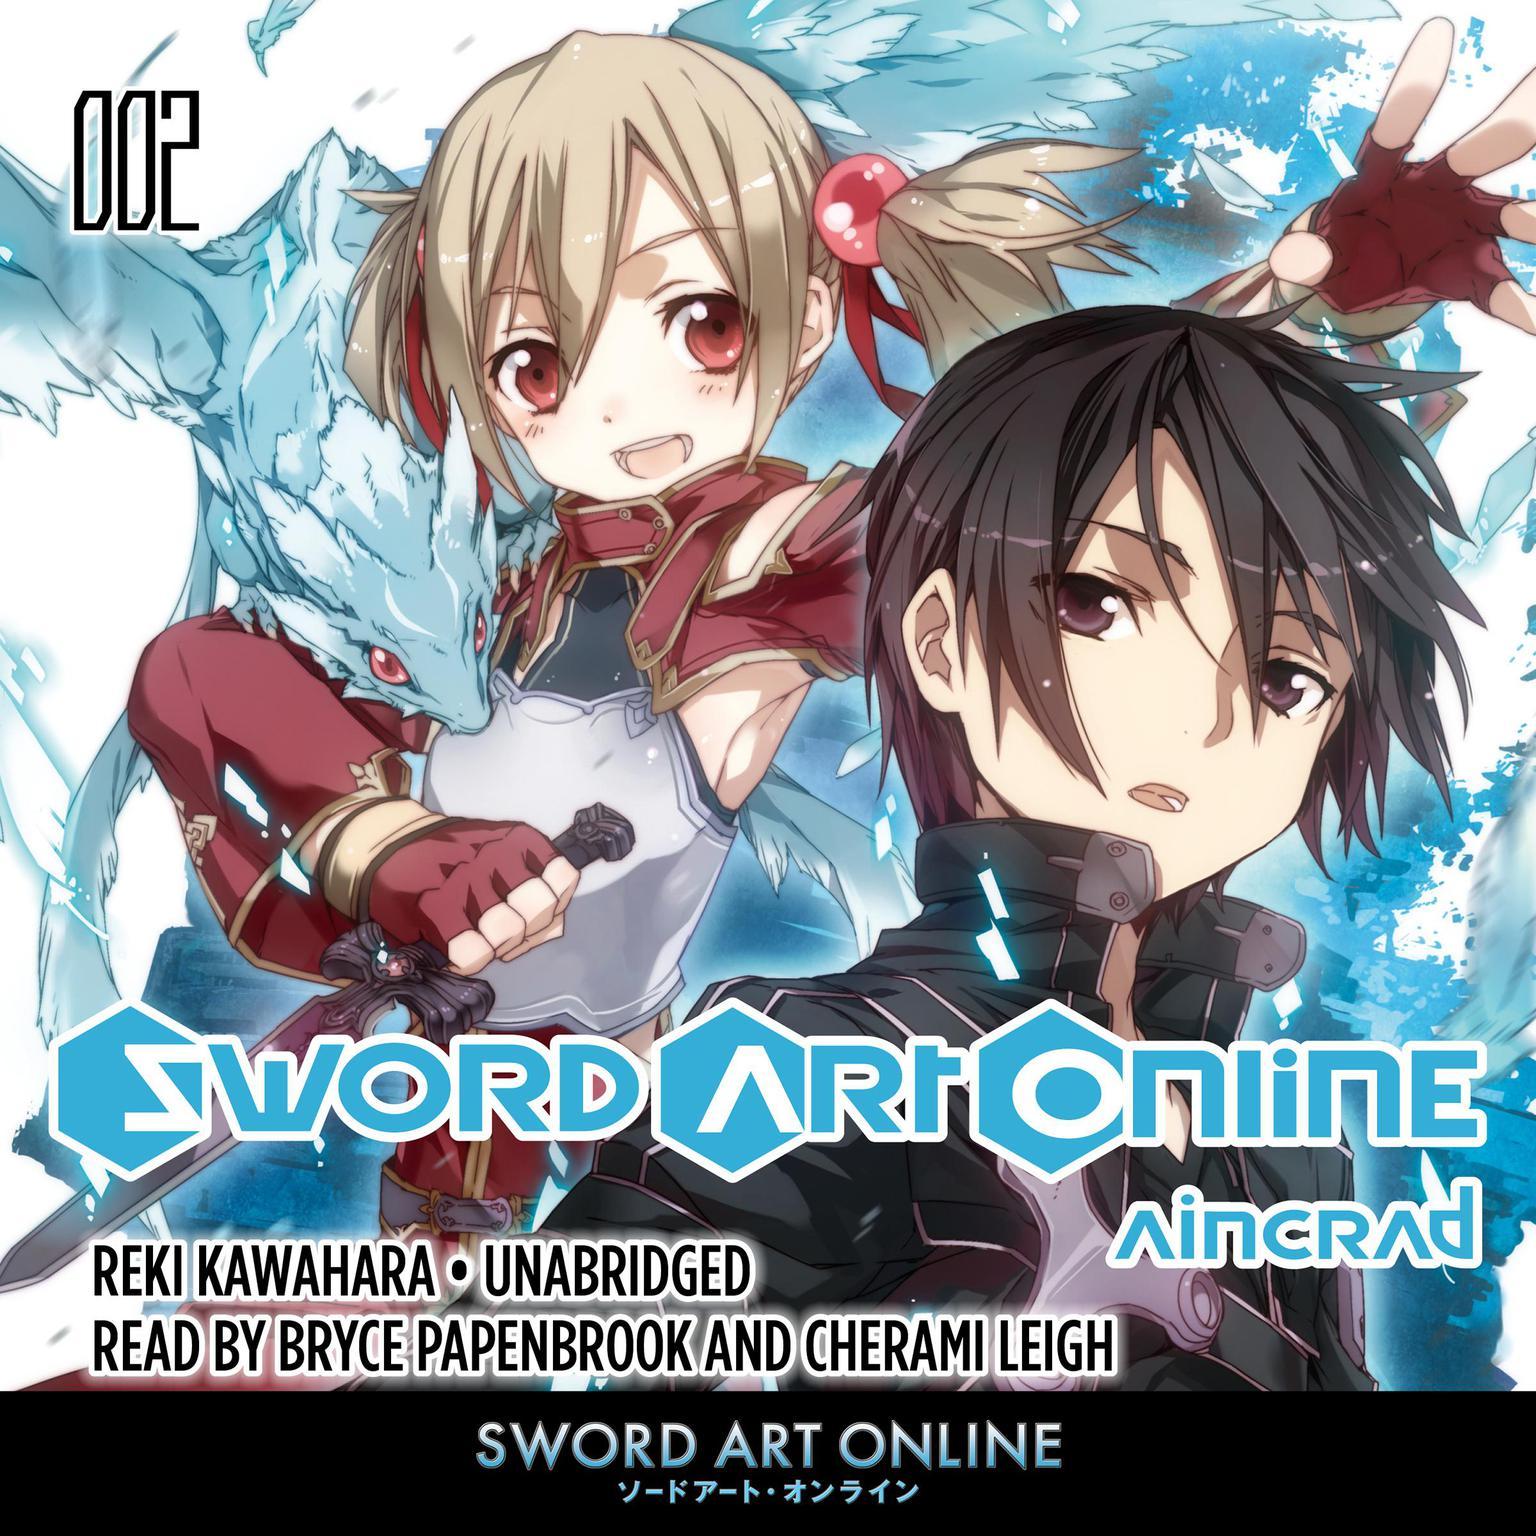 Sword Art Online 2: Aincrad (light novel) Audiobook, by Reki Kawahara